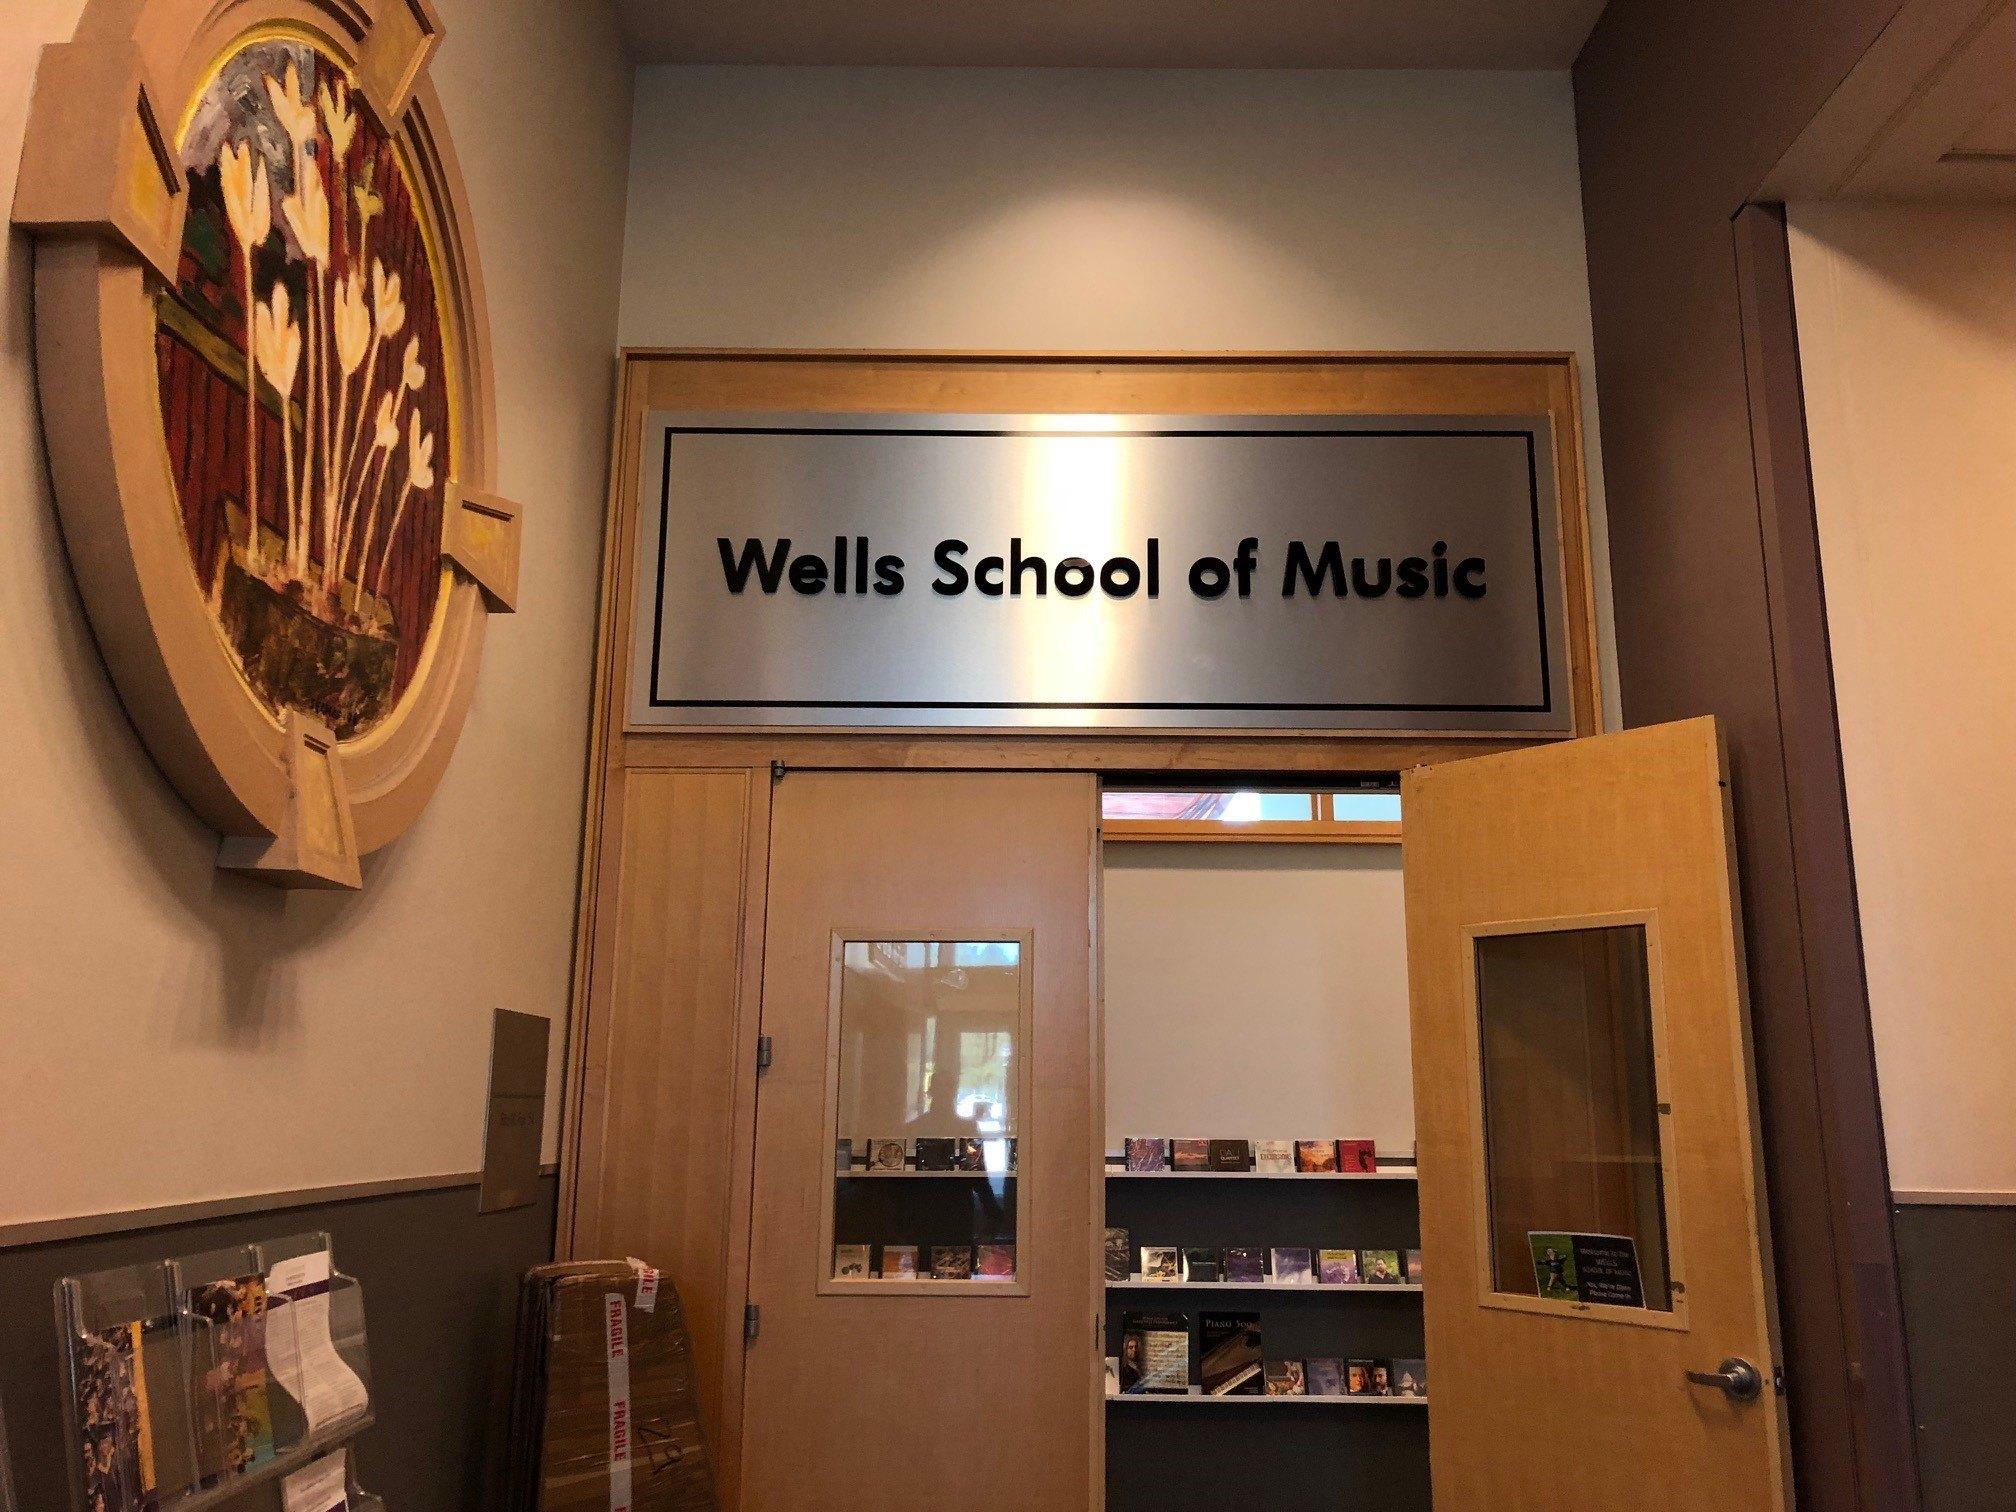 WCU Sign Wells School of Music